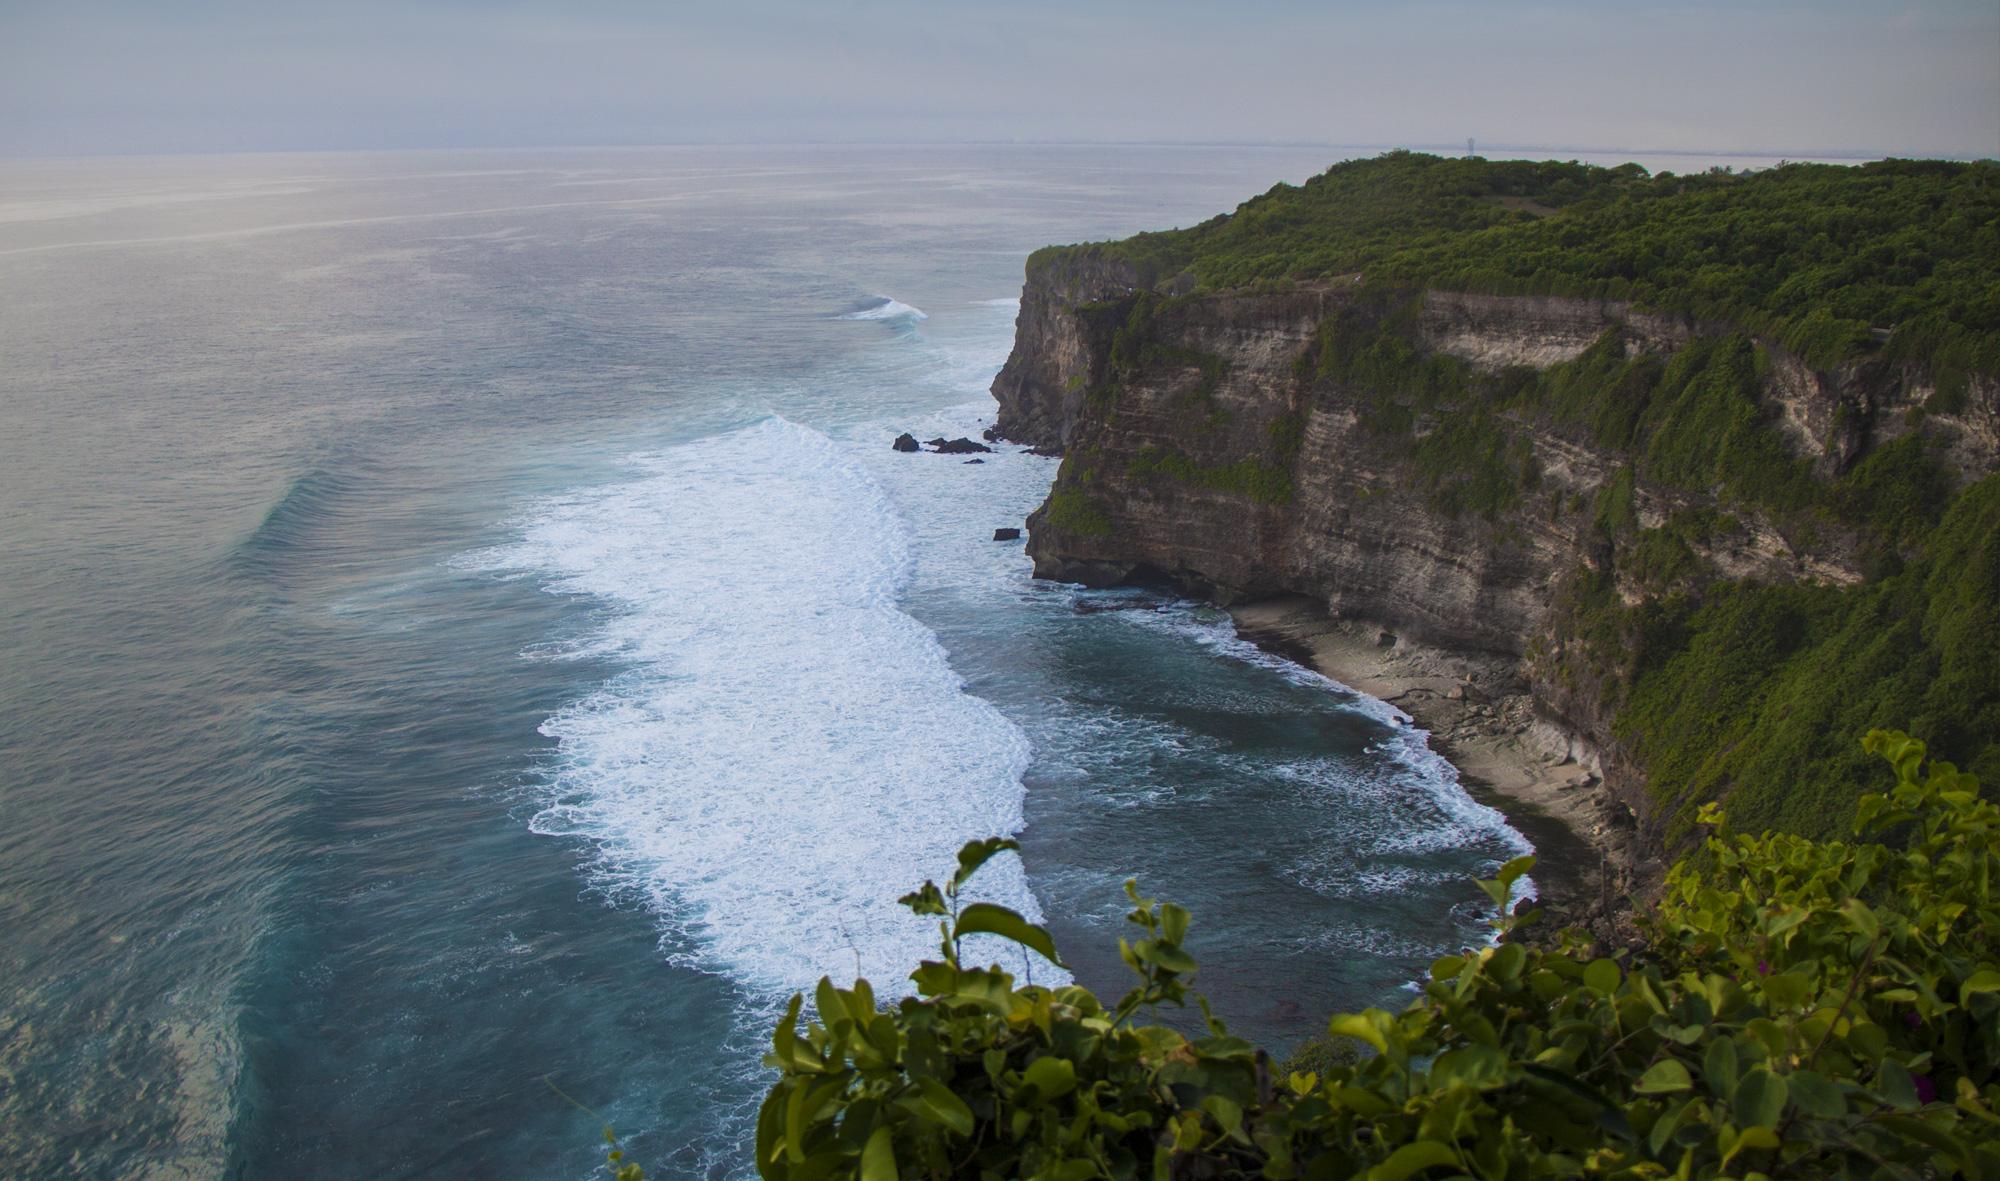 Uluwatu, Bali. #Ocean #Surfing